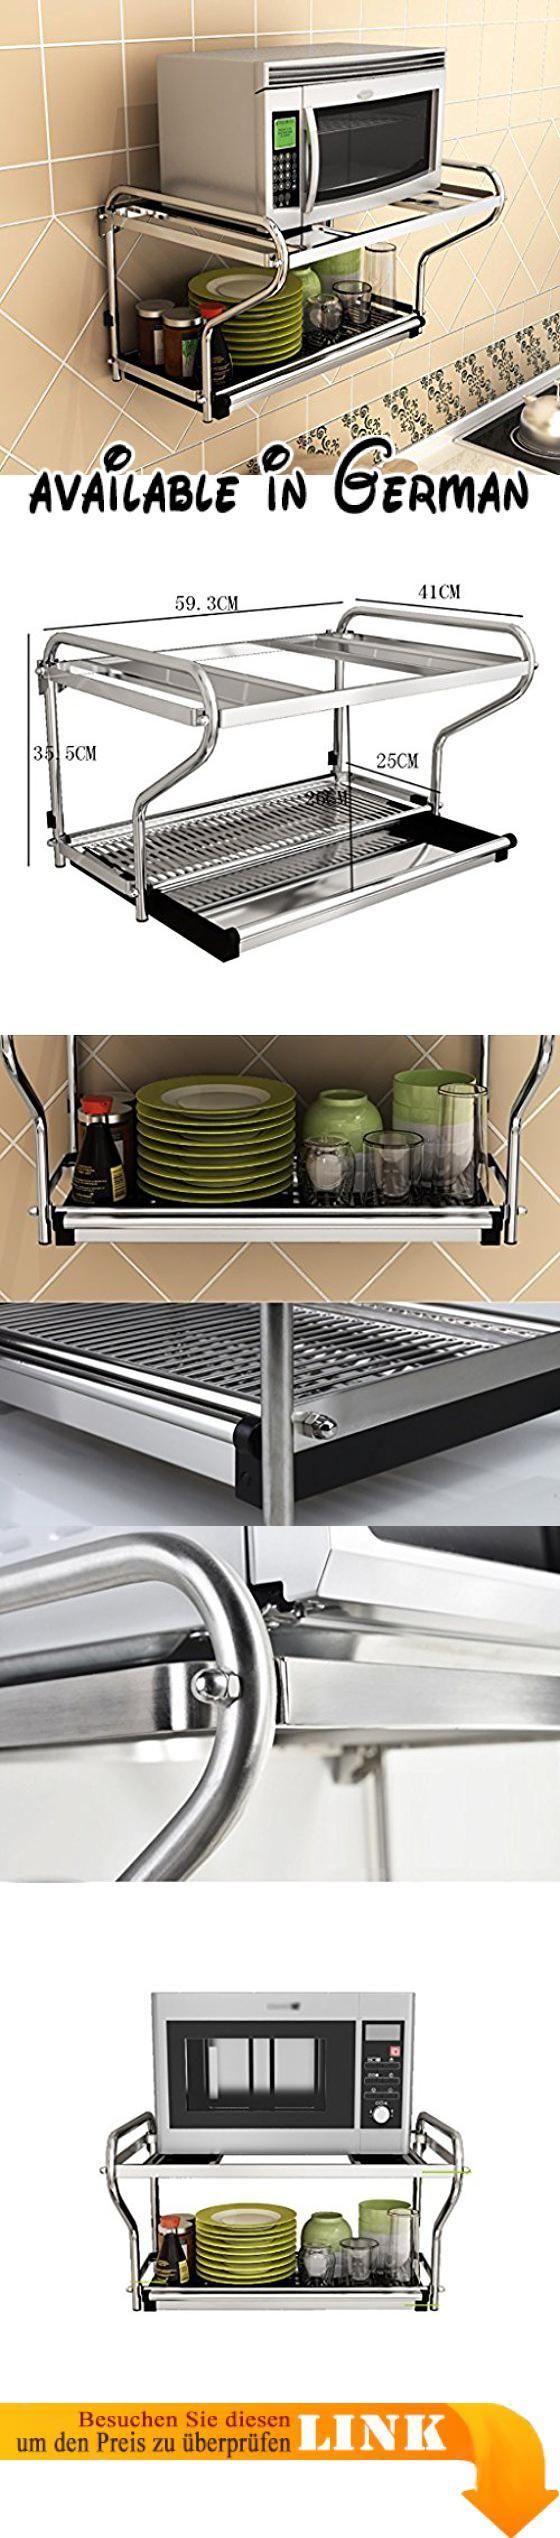 B078V2BGCT : Küche Regal Mikrowelle Ofen Rack Ofen Doppelschicht ...